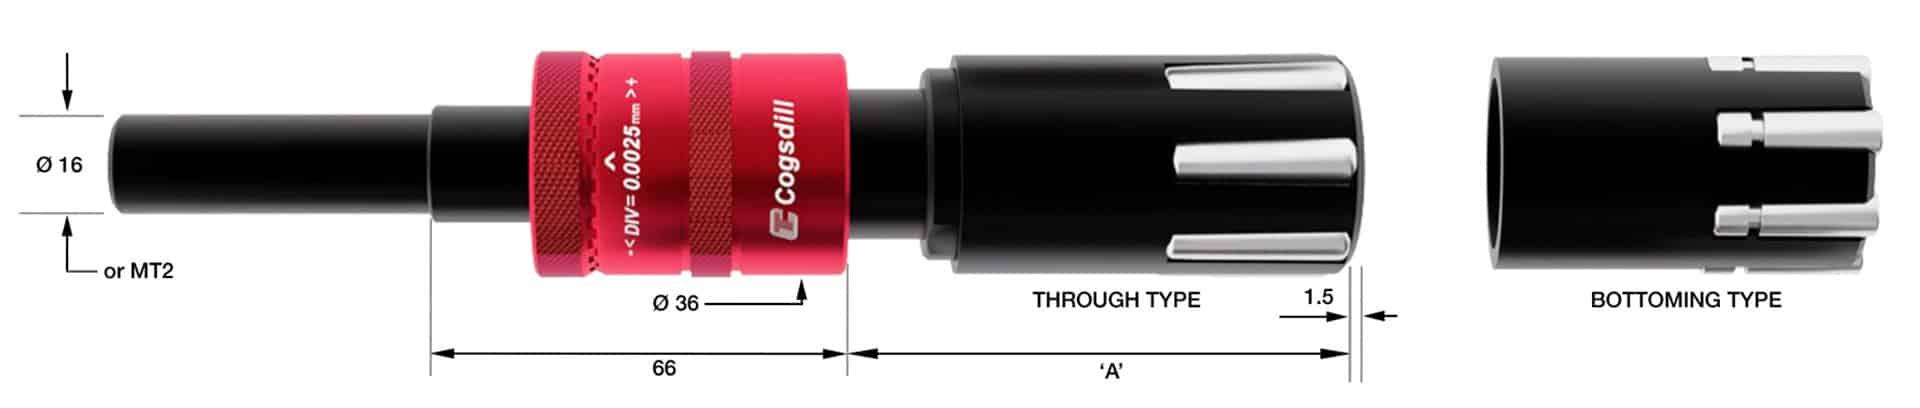 Rollen-Burnishing SRMR38-25-50 Diagramm